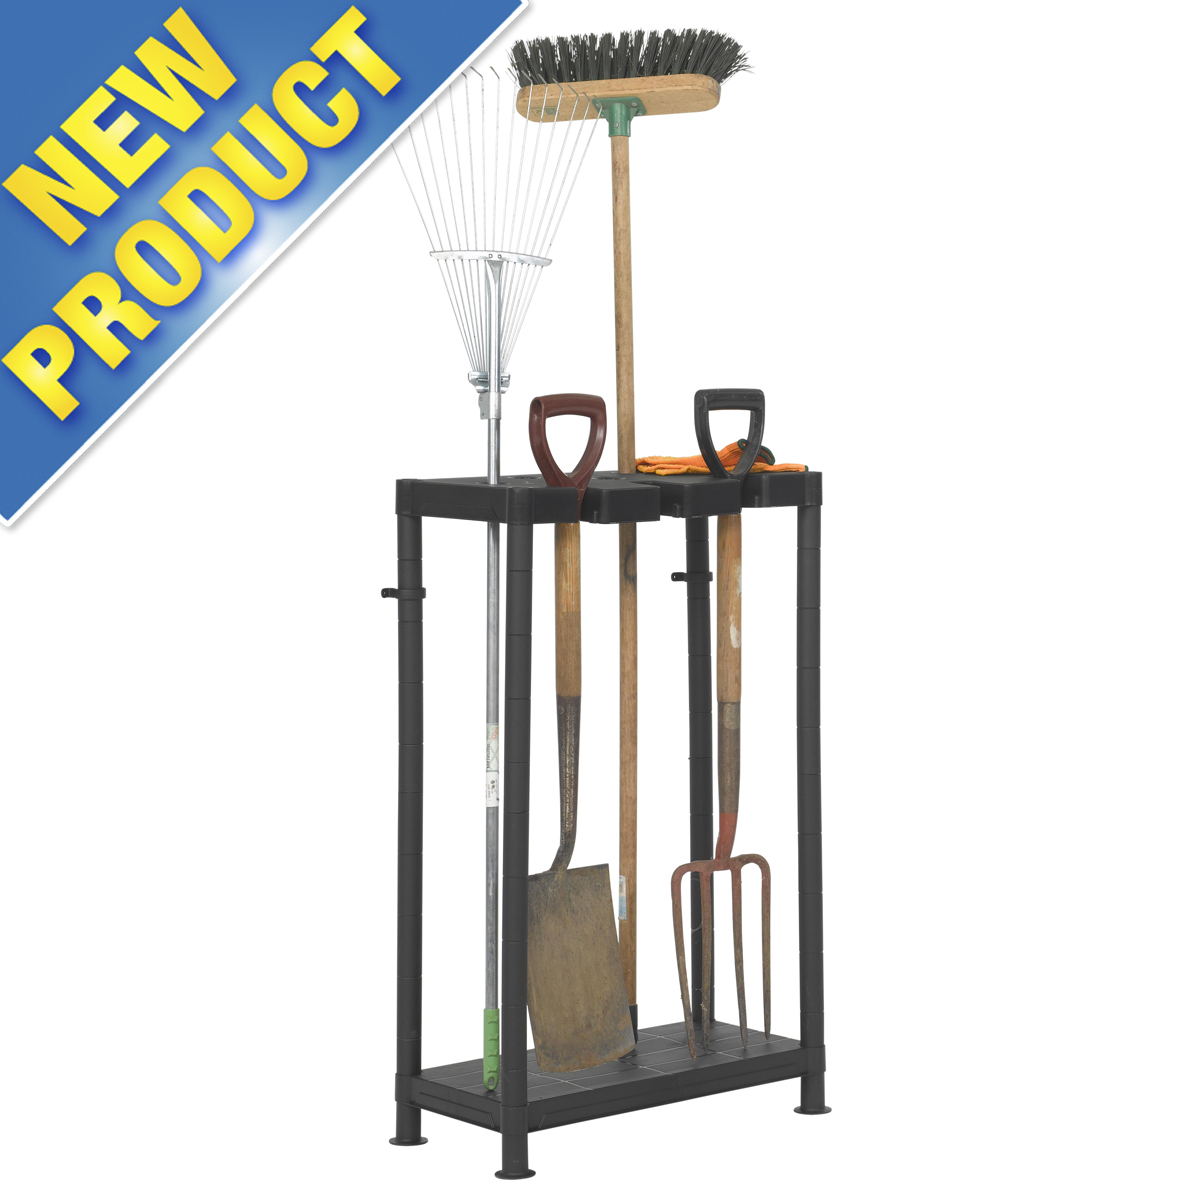 Garden tool storage organizer rack for garage or shed for Garden shed shelving